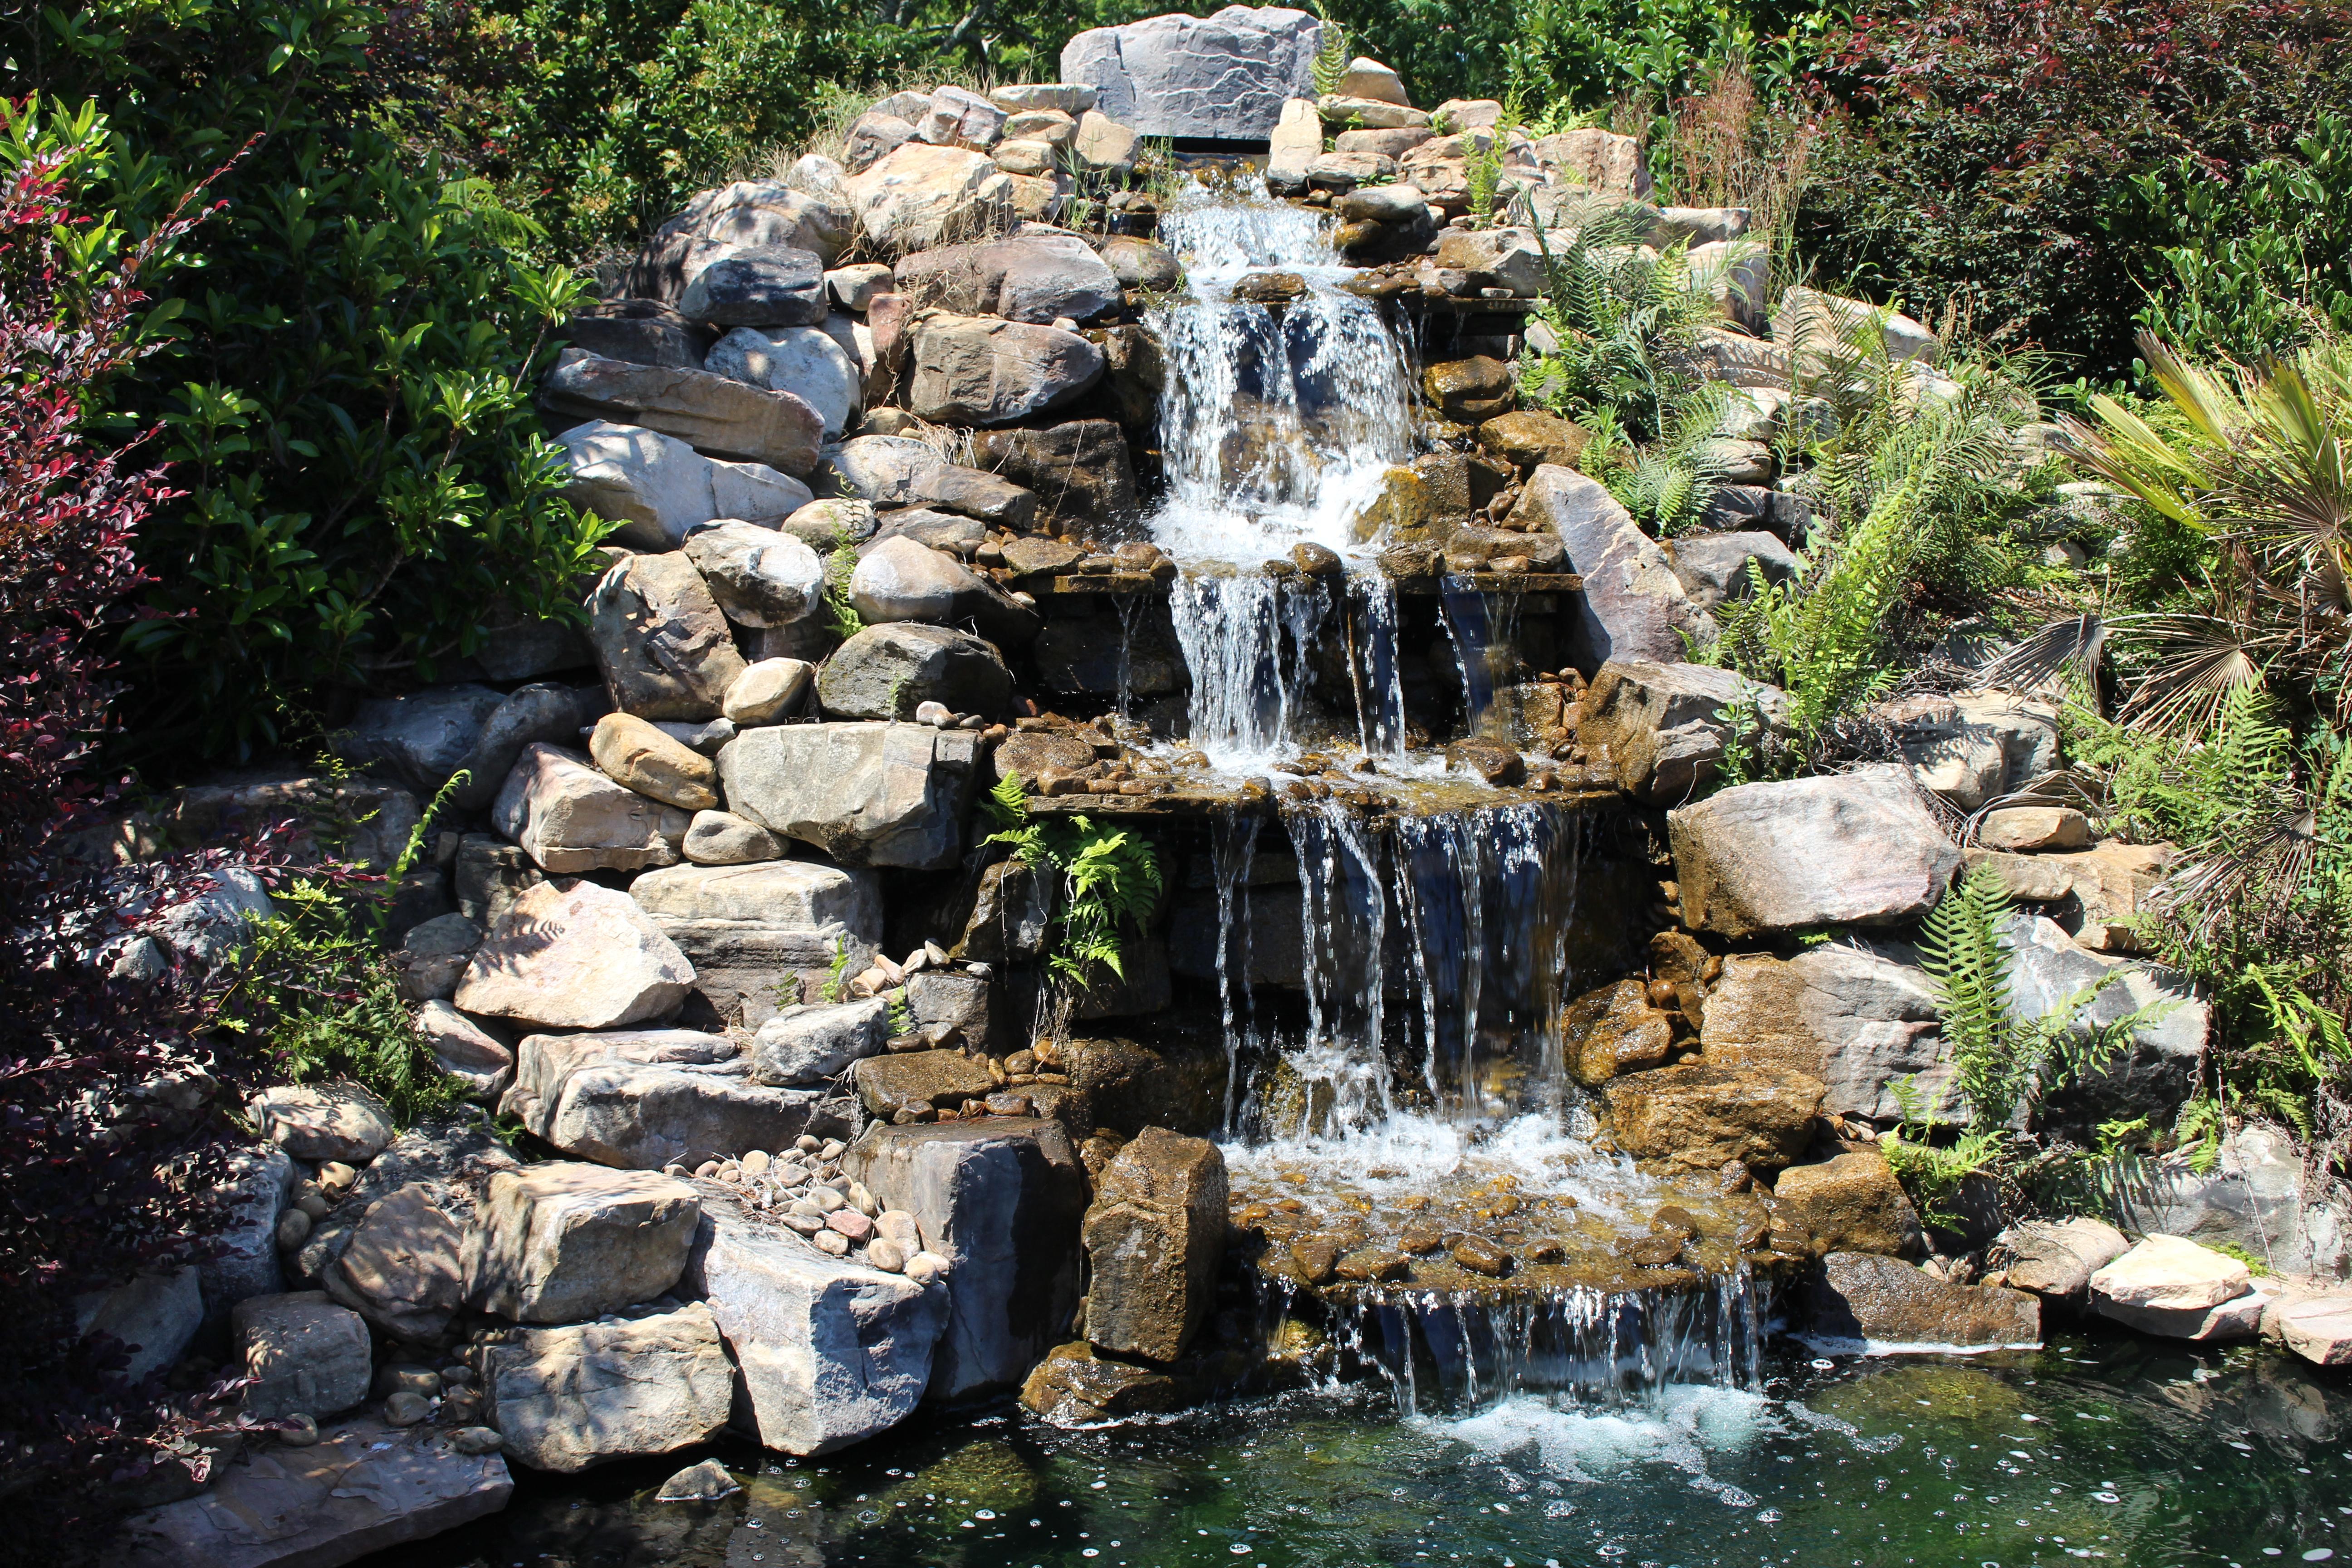 File:Coastal Georgia Botanical Gardens, Waterfall